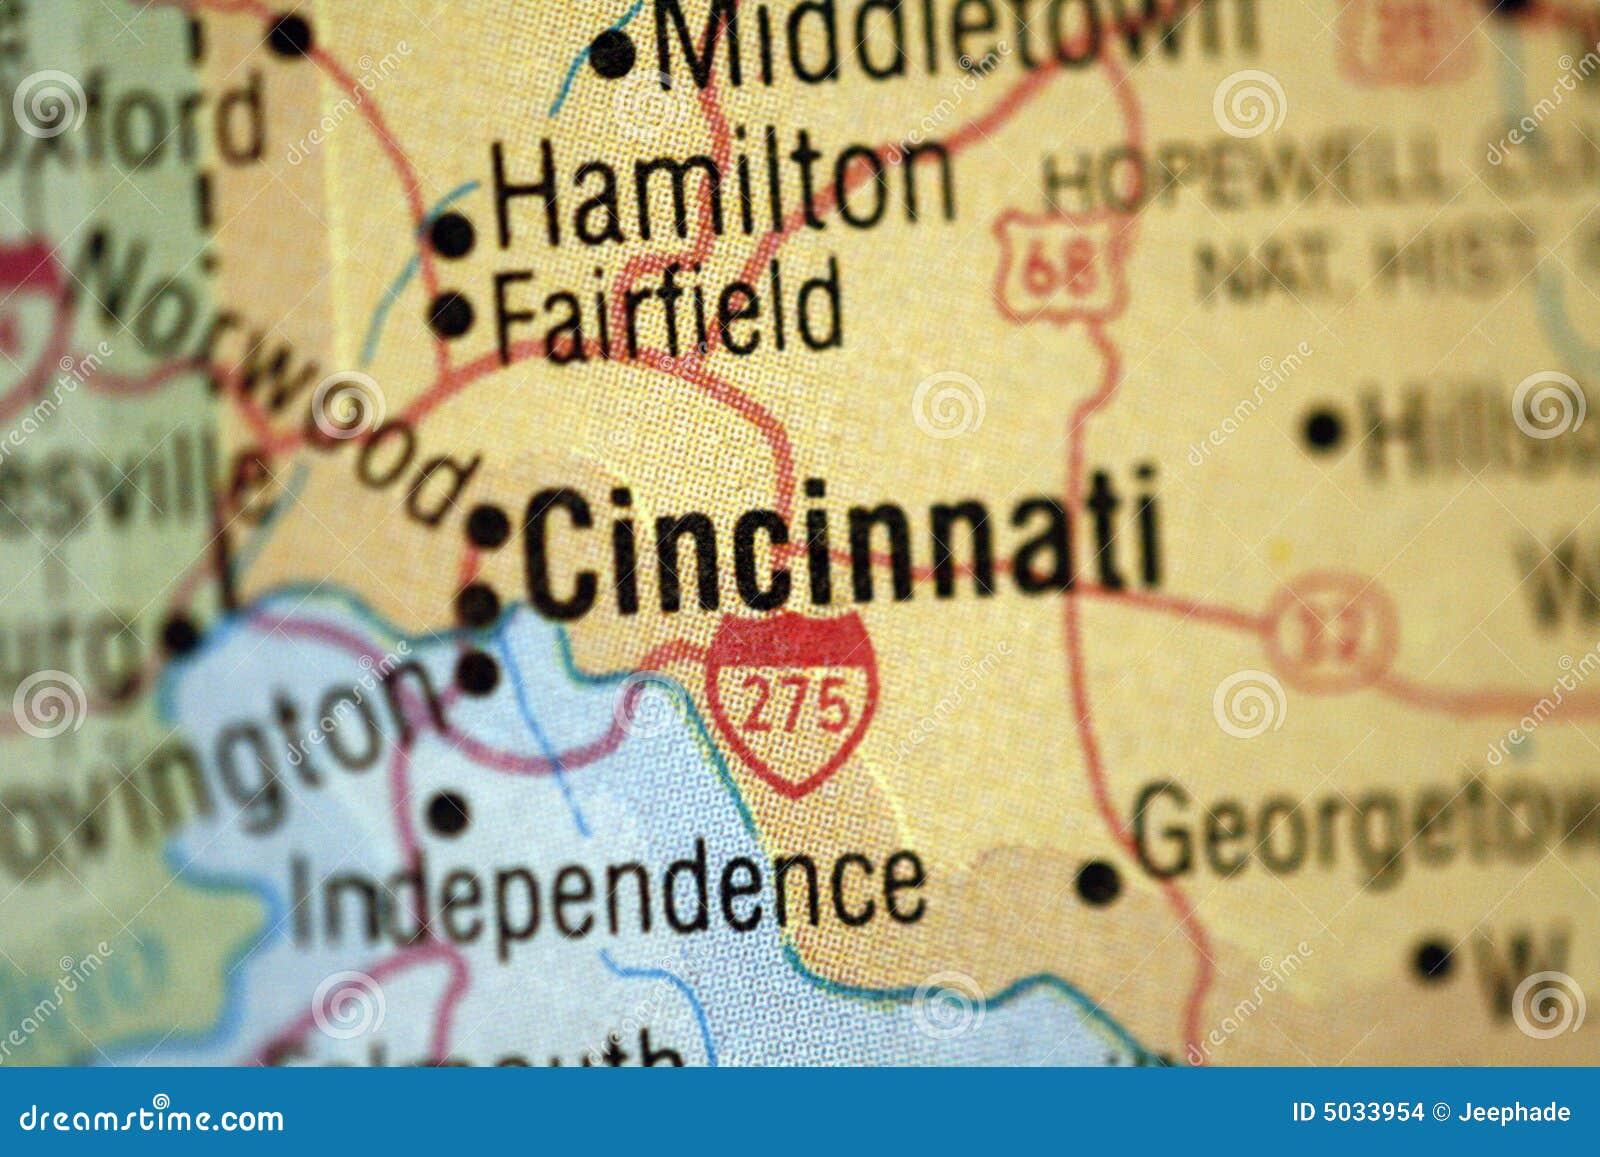 Map Of Cincinnati Ohio Stock Photo Image Of Ohio Cincinnati 5033954